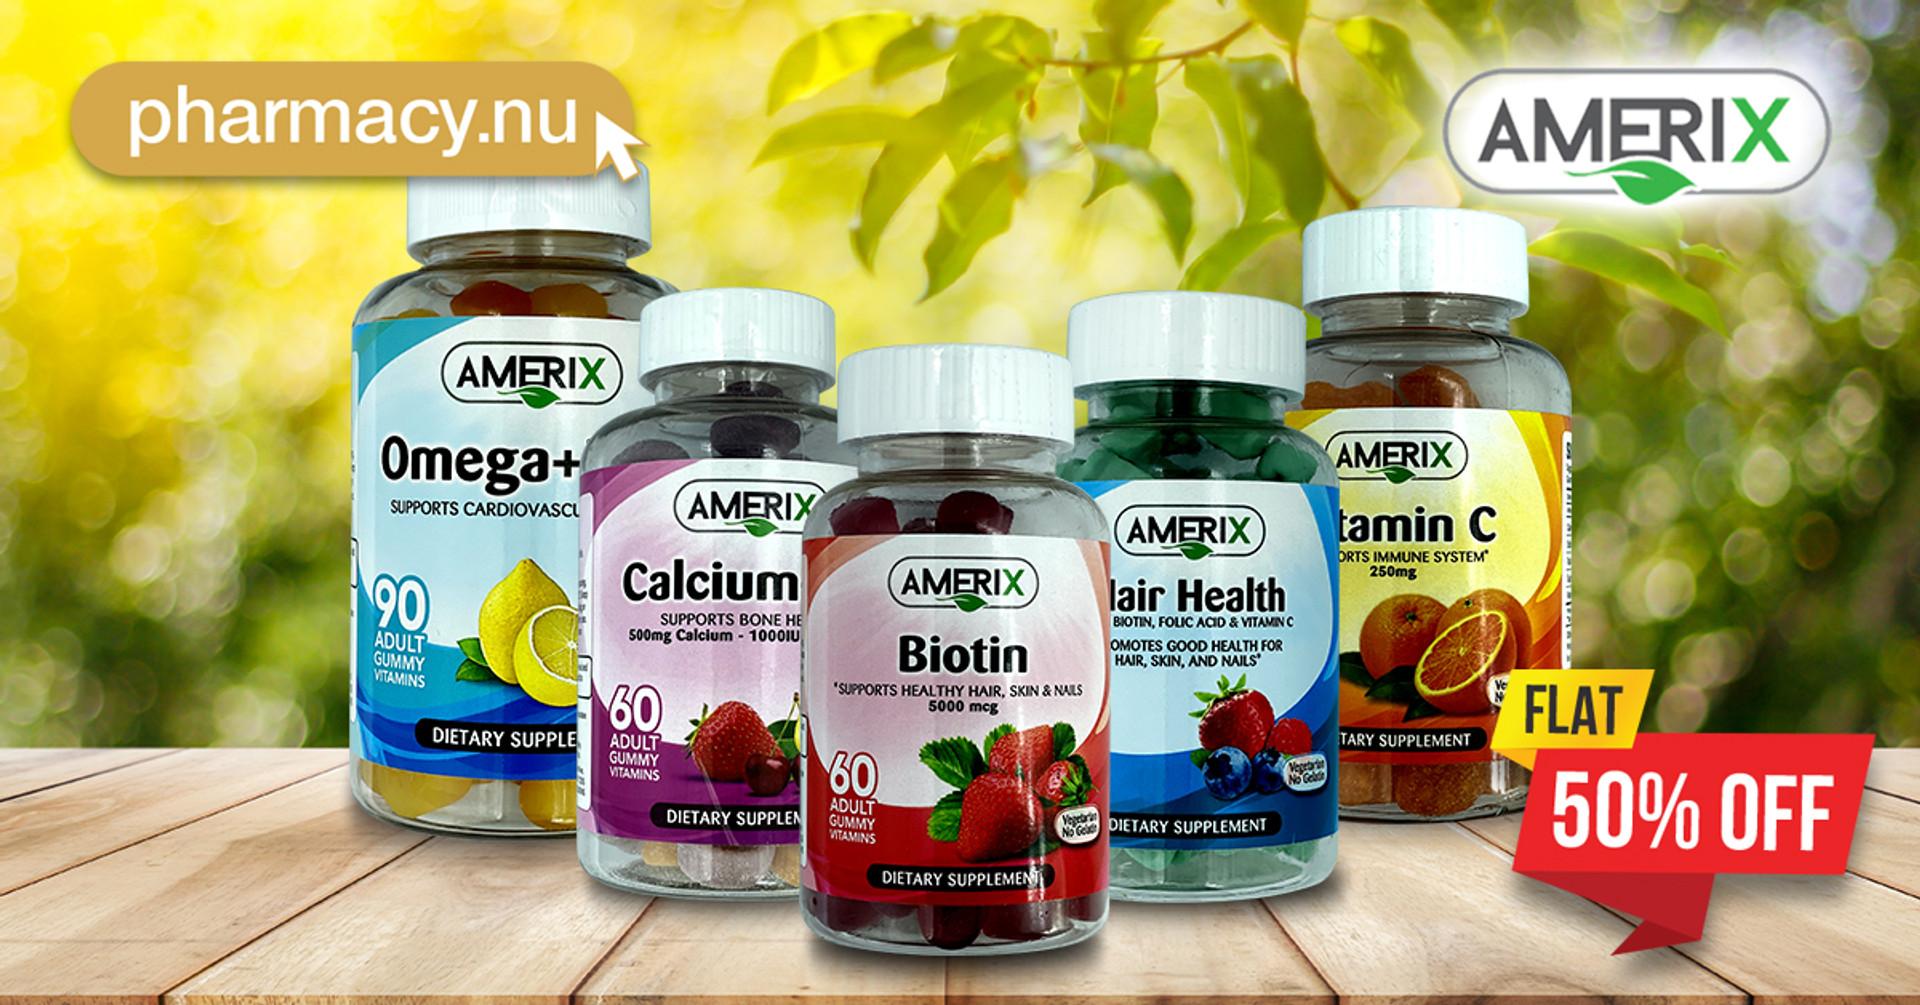 Amerix Vitamins are at 50% Discount